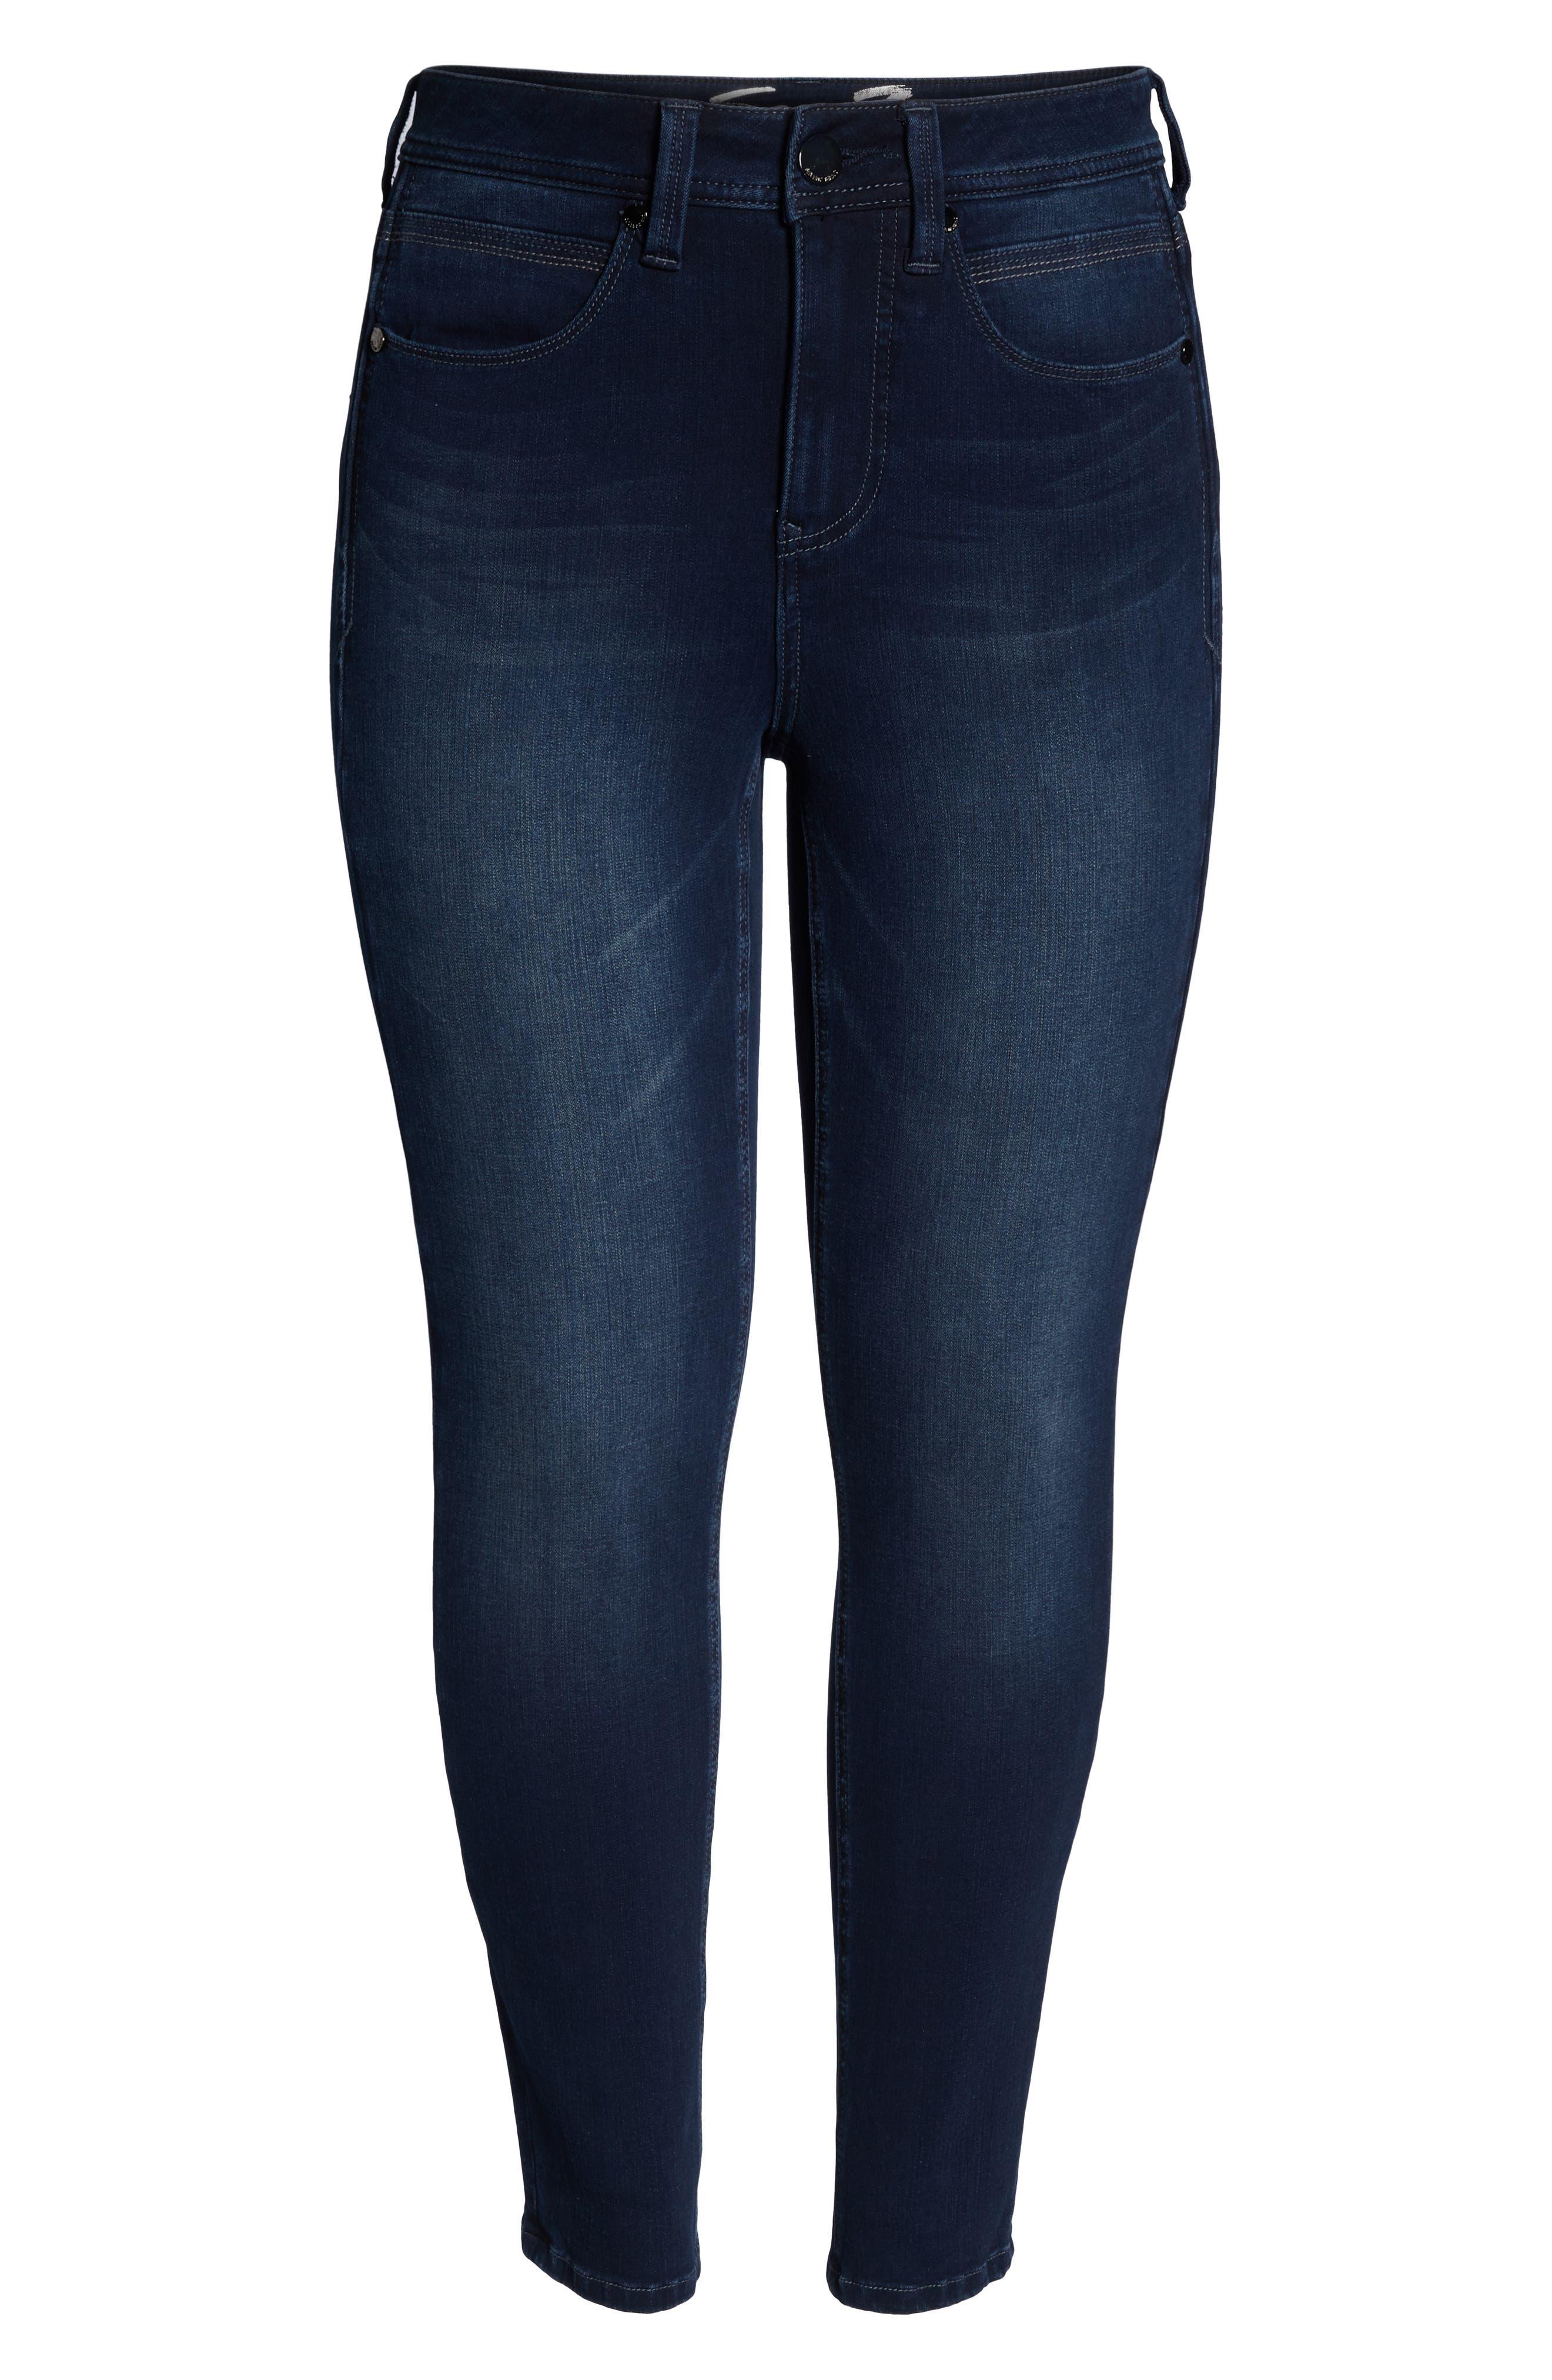 Tummyless Skinny Jeans,                             Alternate thumbnail 7, color,                             JE TAIME